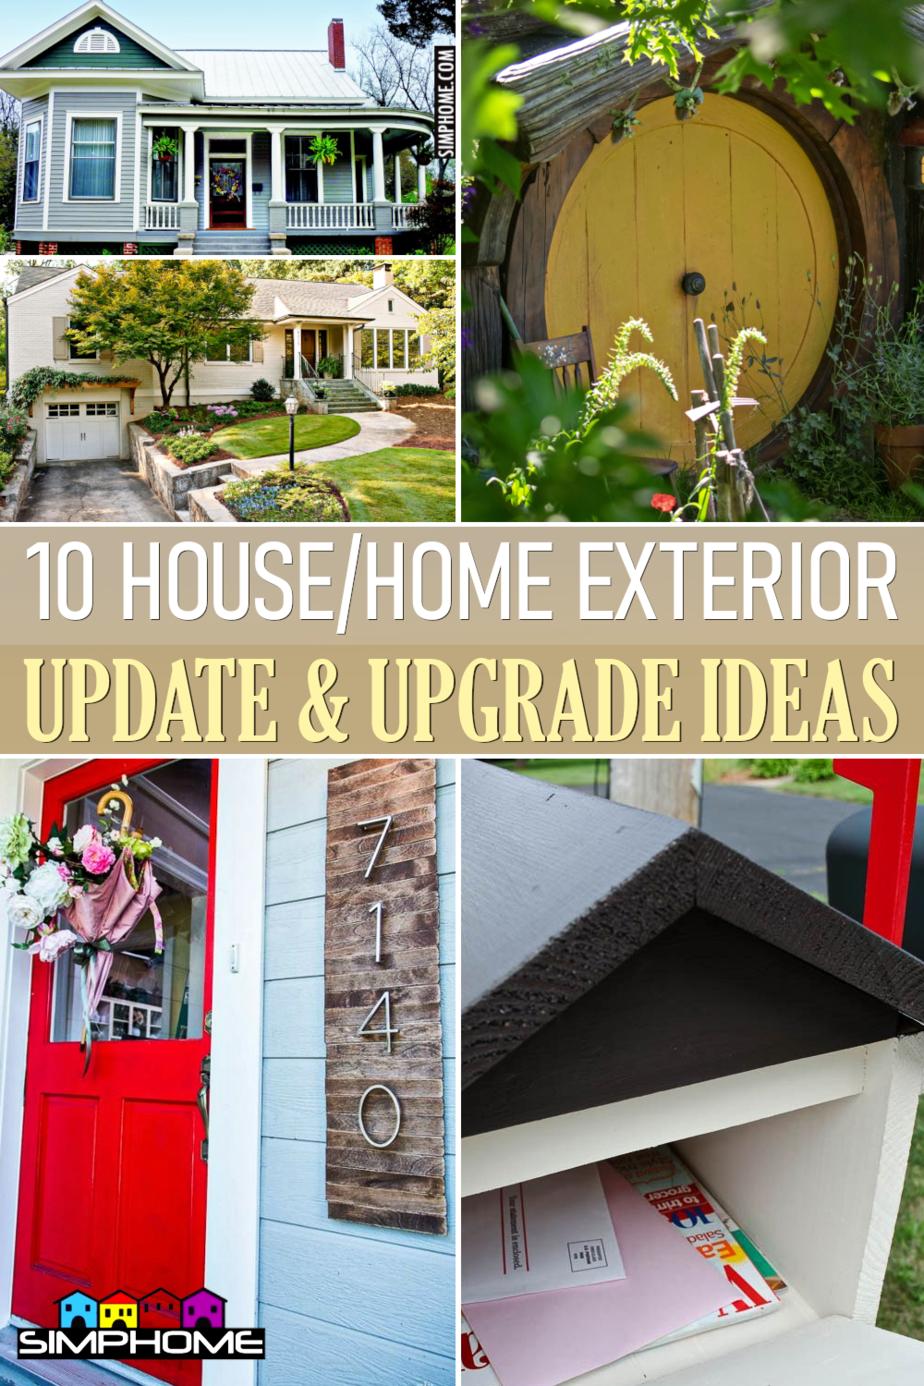 10 Exterior Update Ideas via Simphome.comFeaturedl